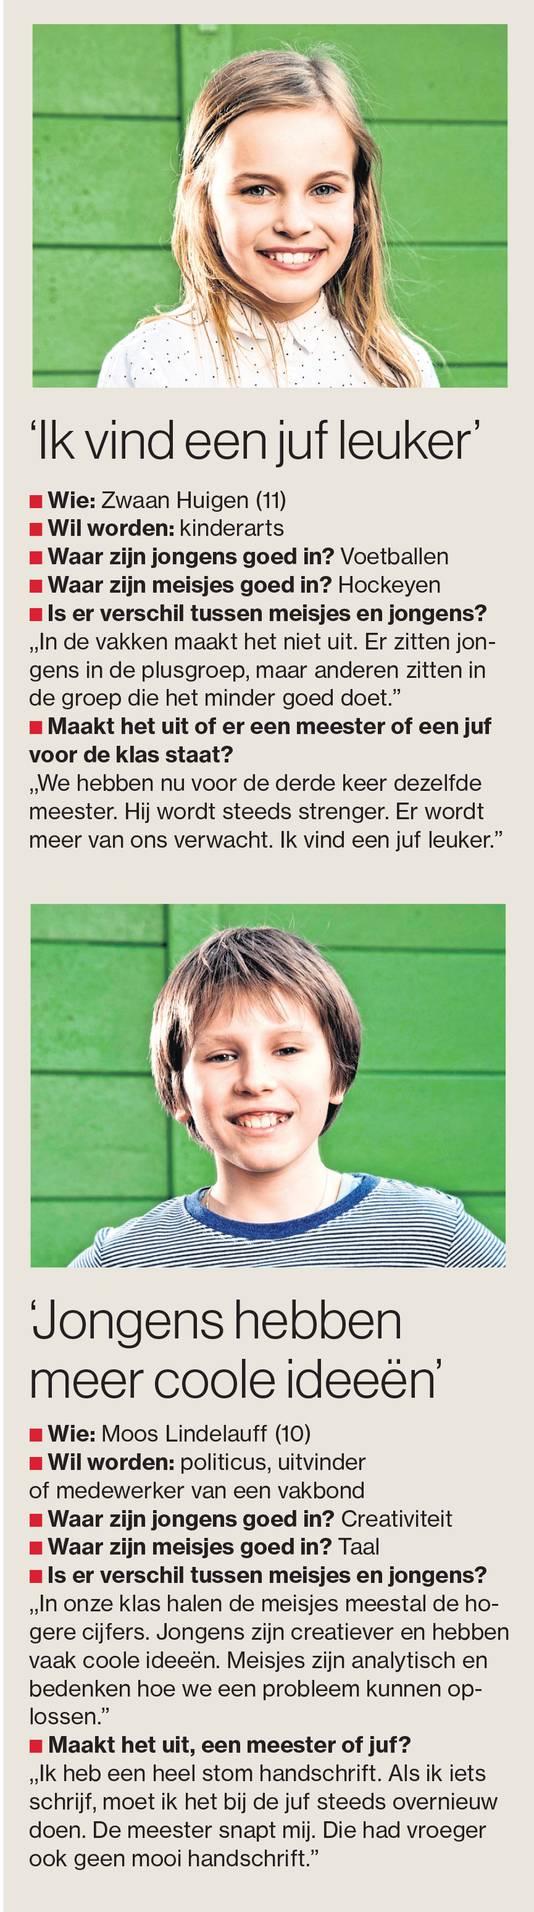 AD/Marco Okhuizen